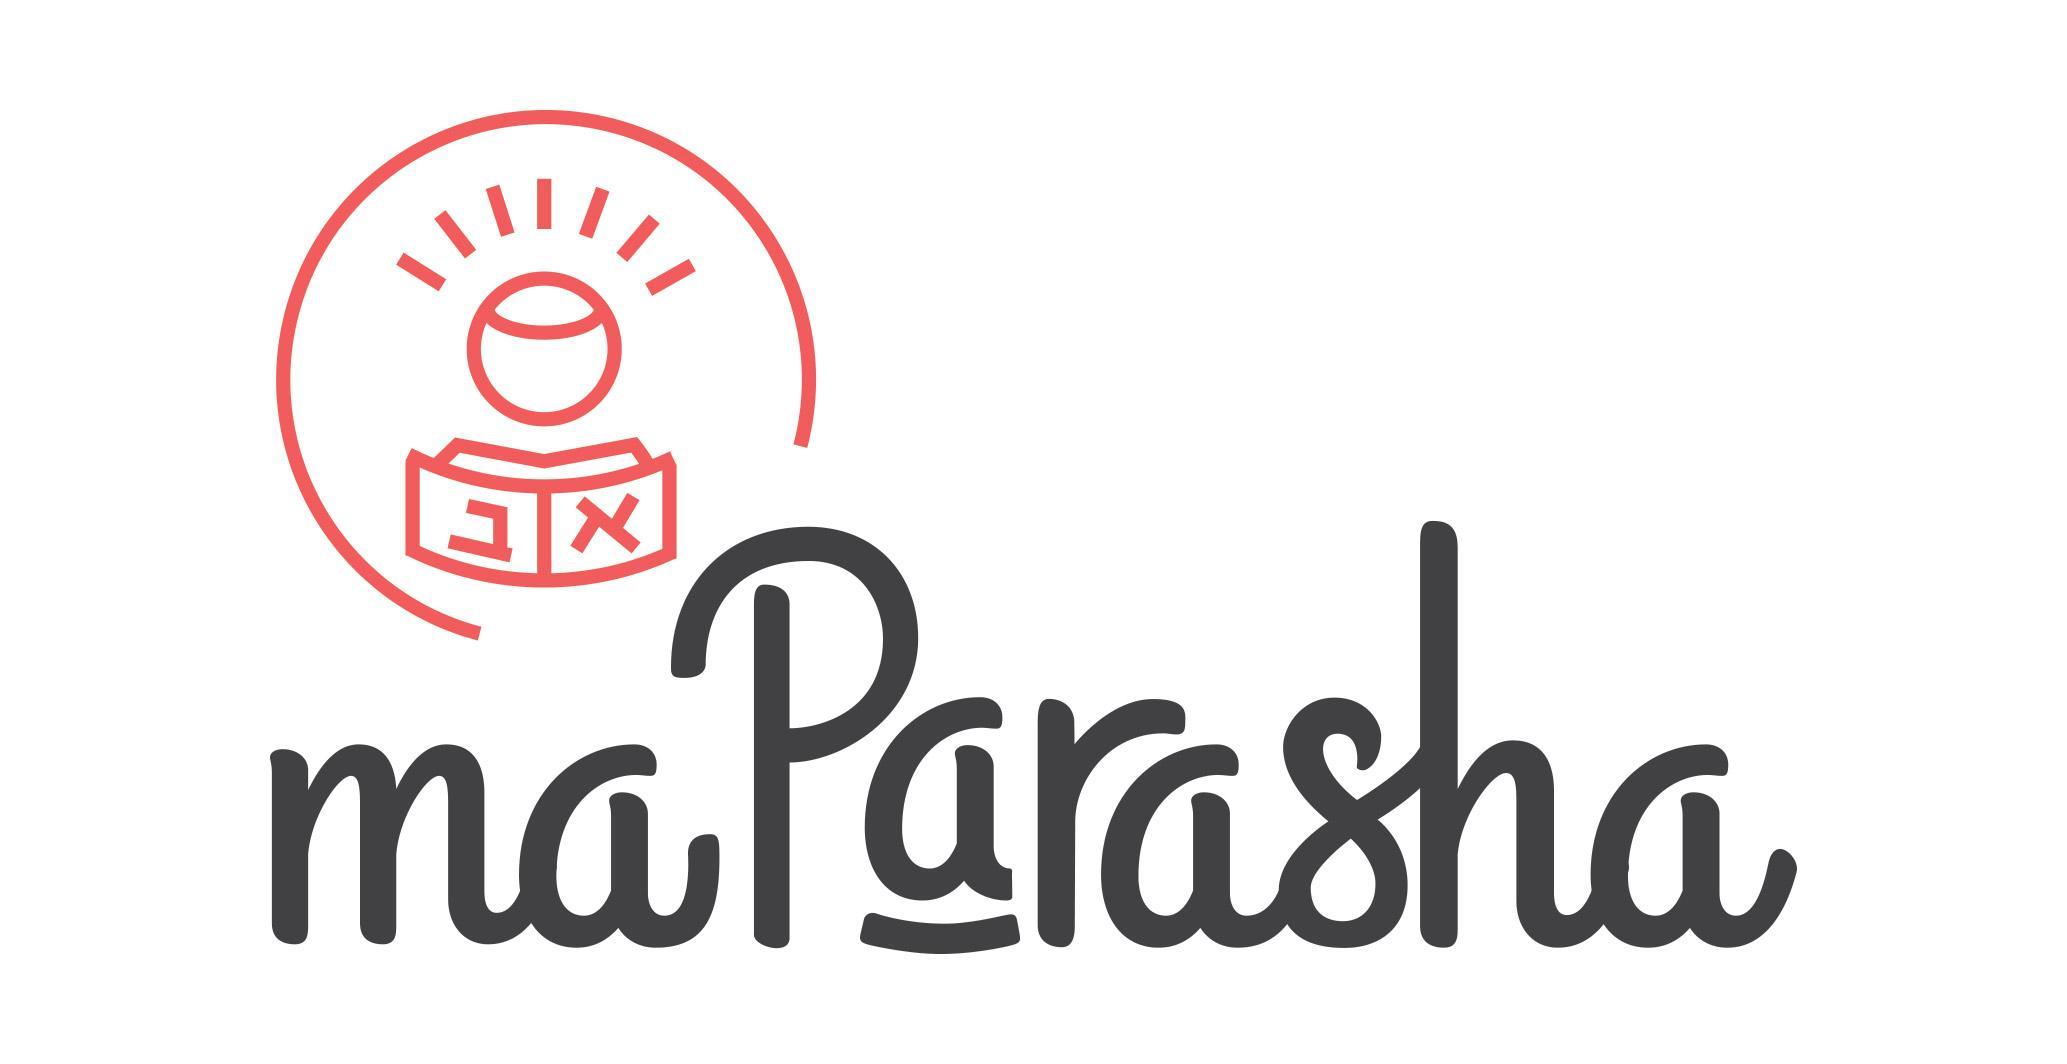 Ma Parasha - image 14 - student project